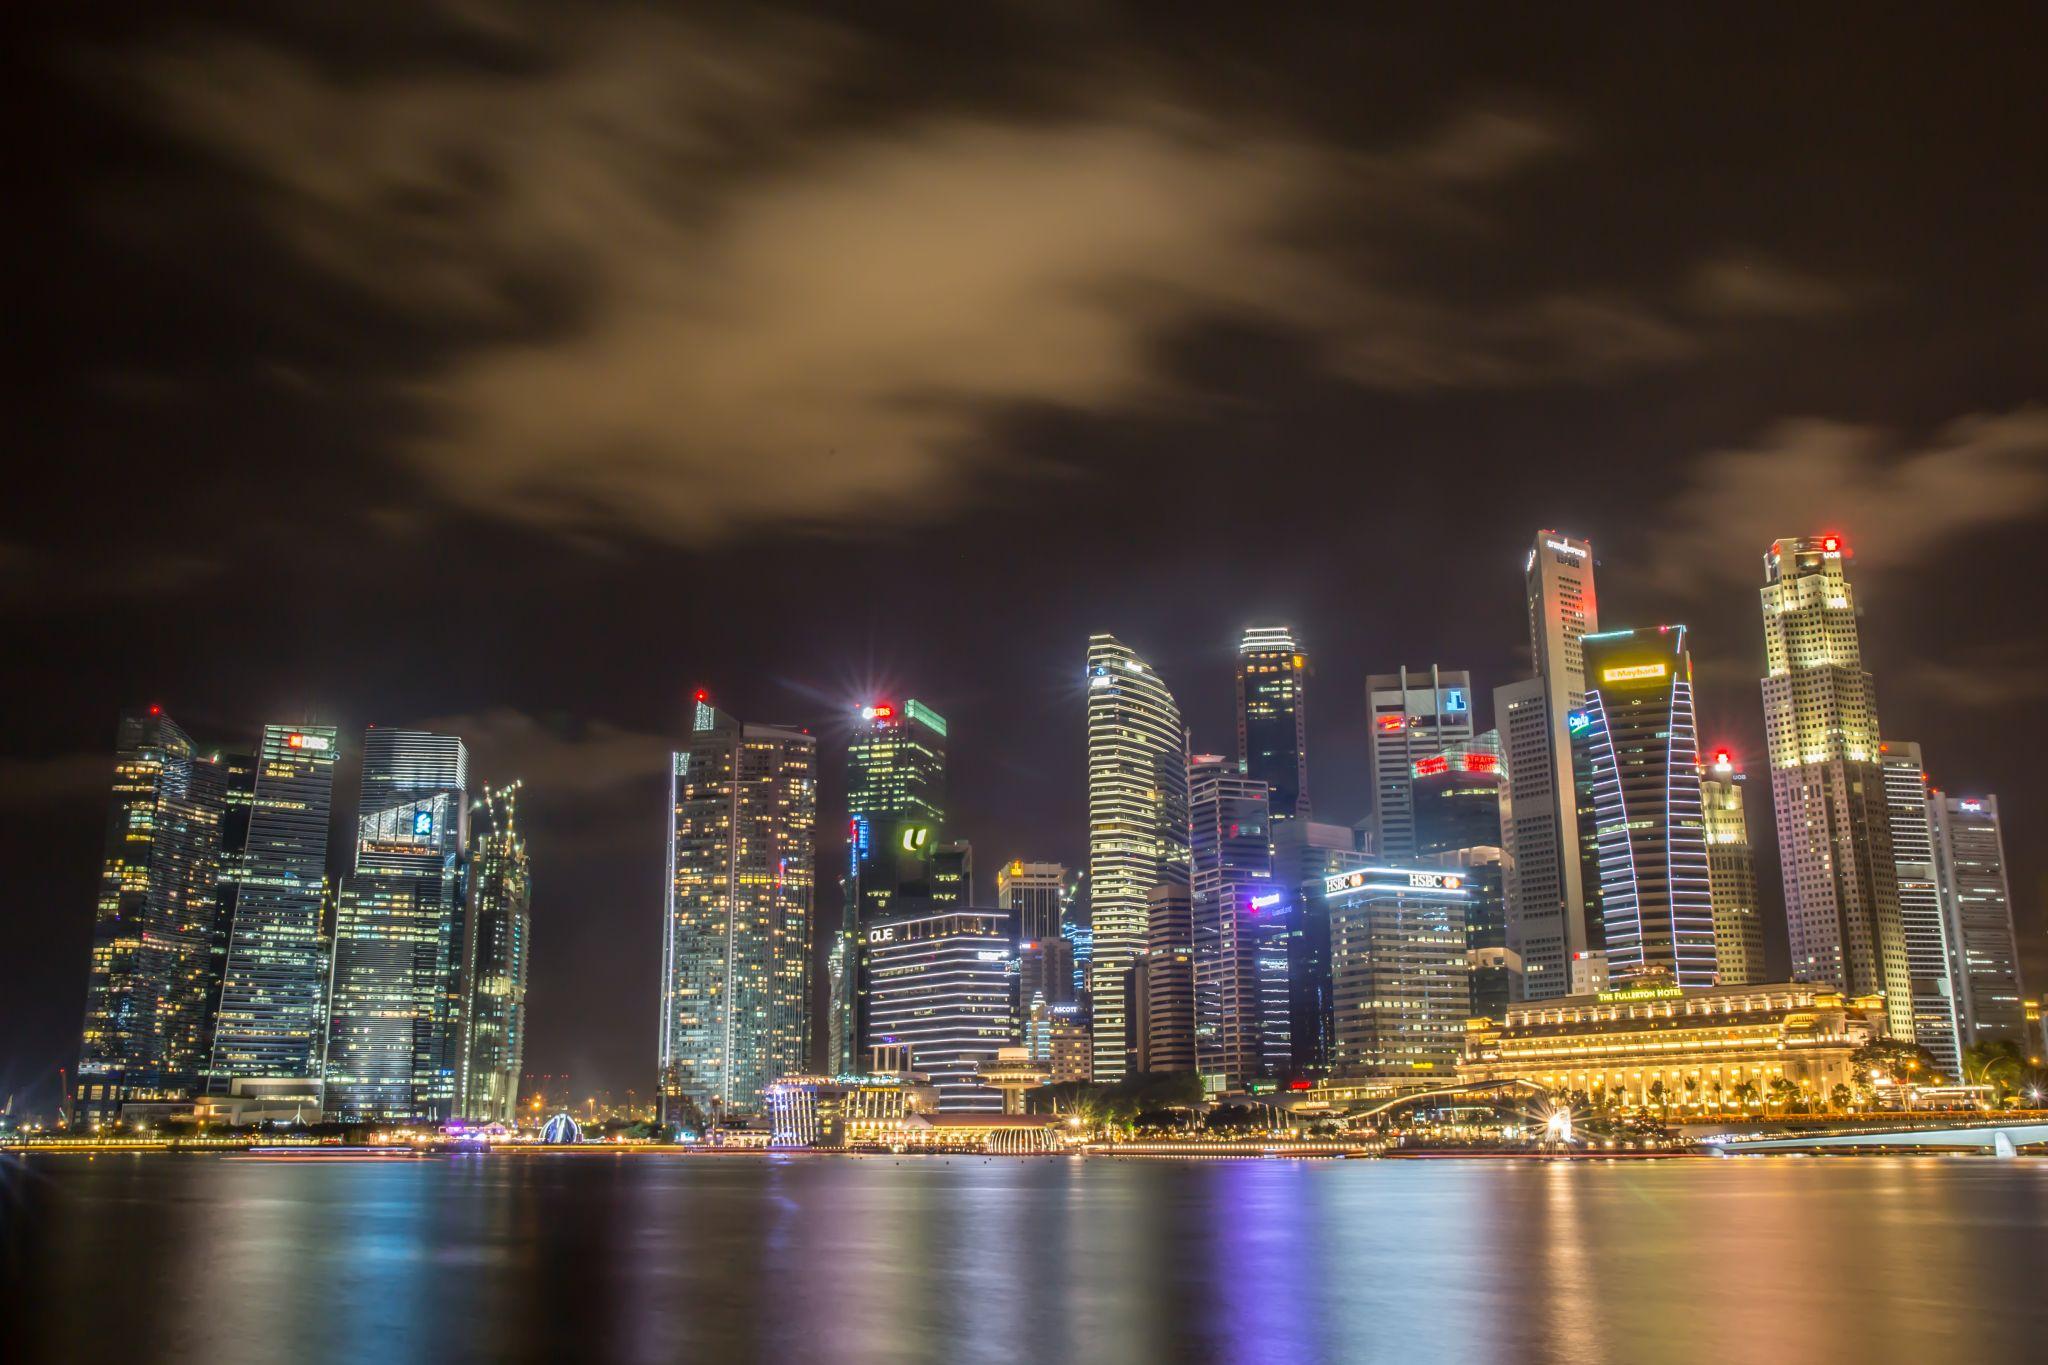 Singapore lights, Singapore